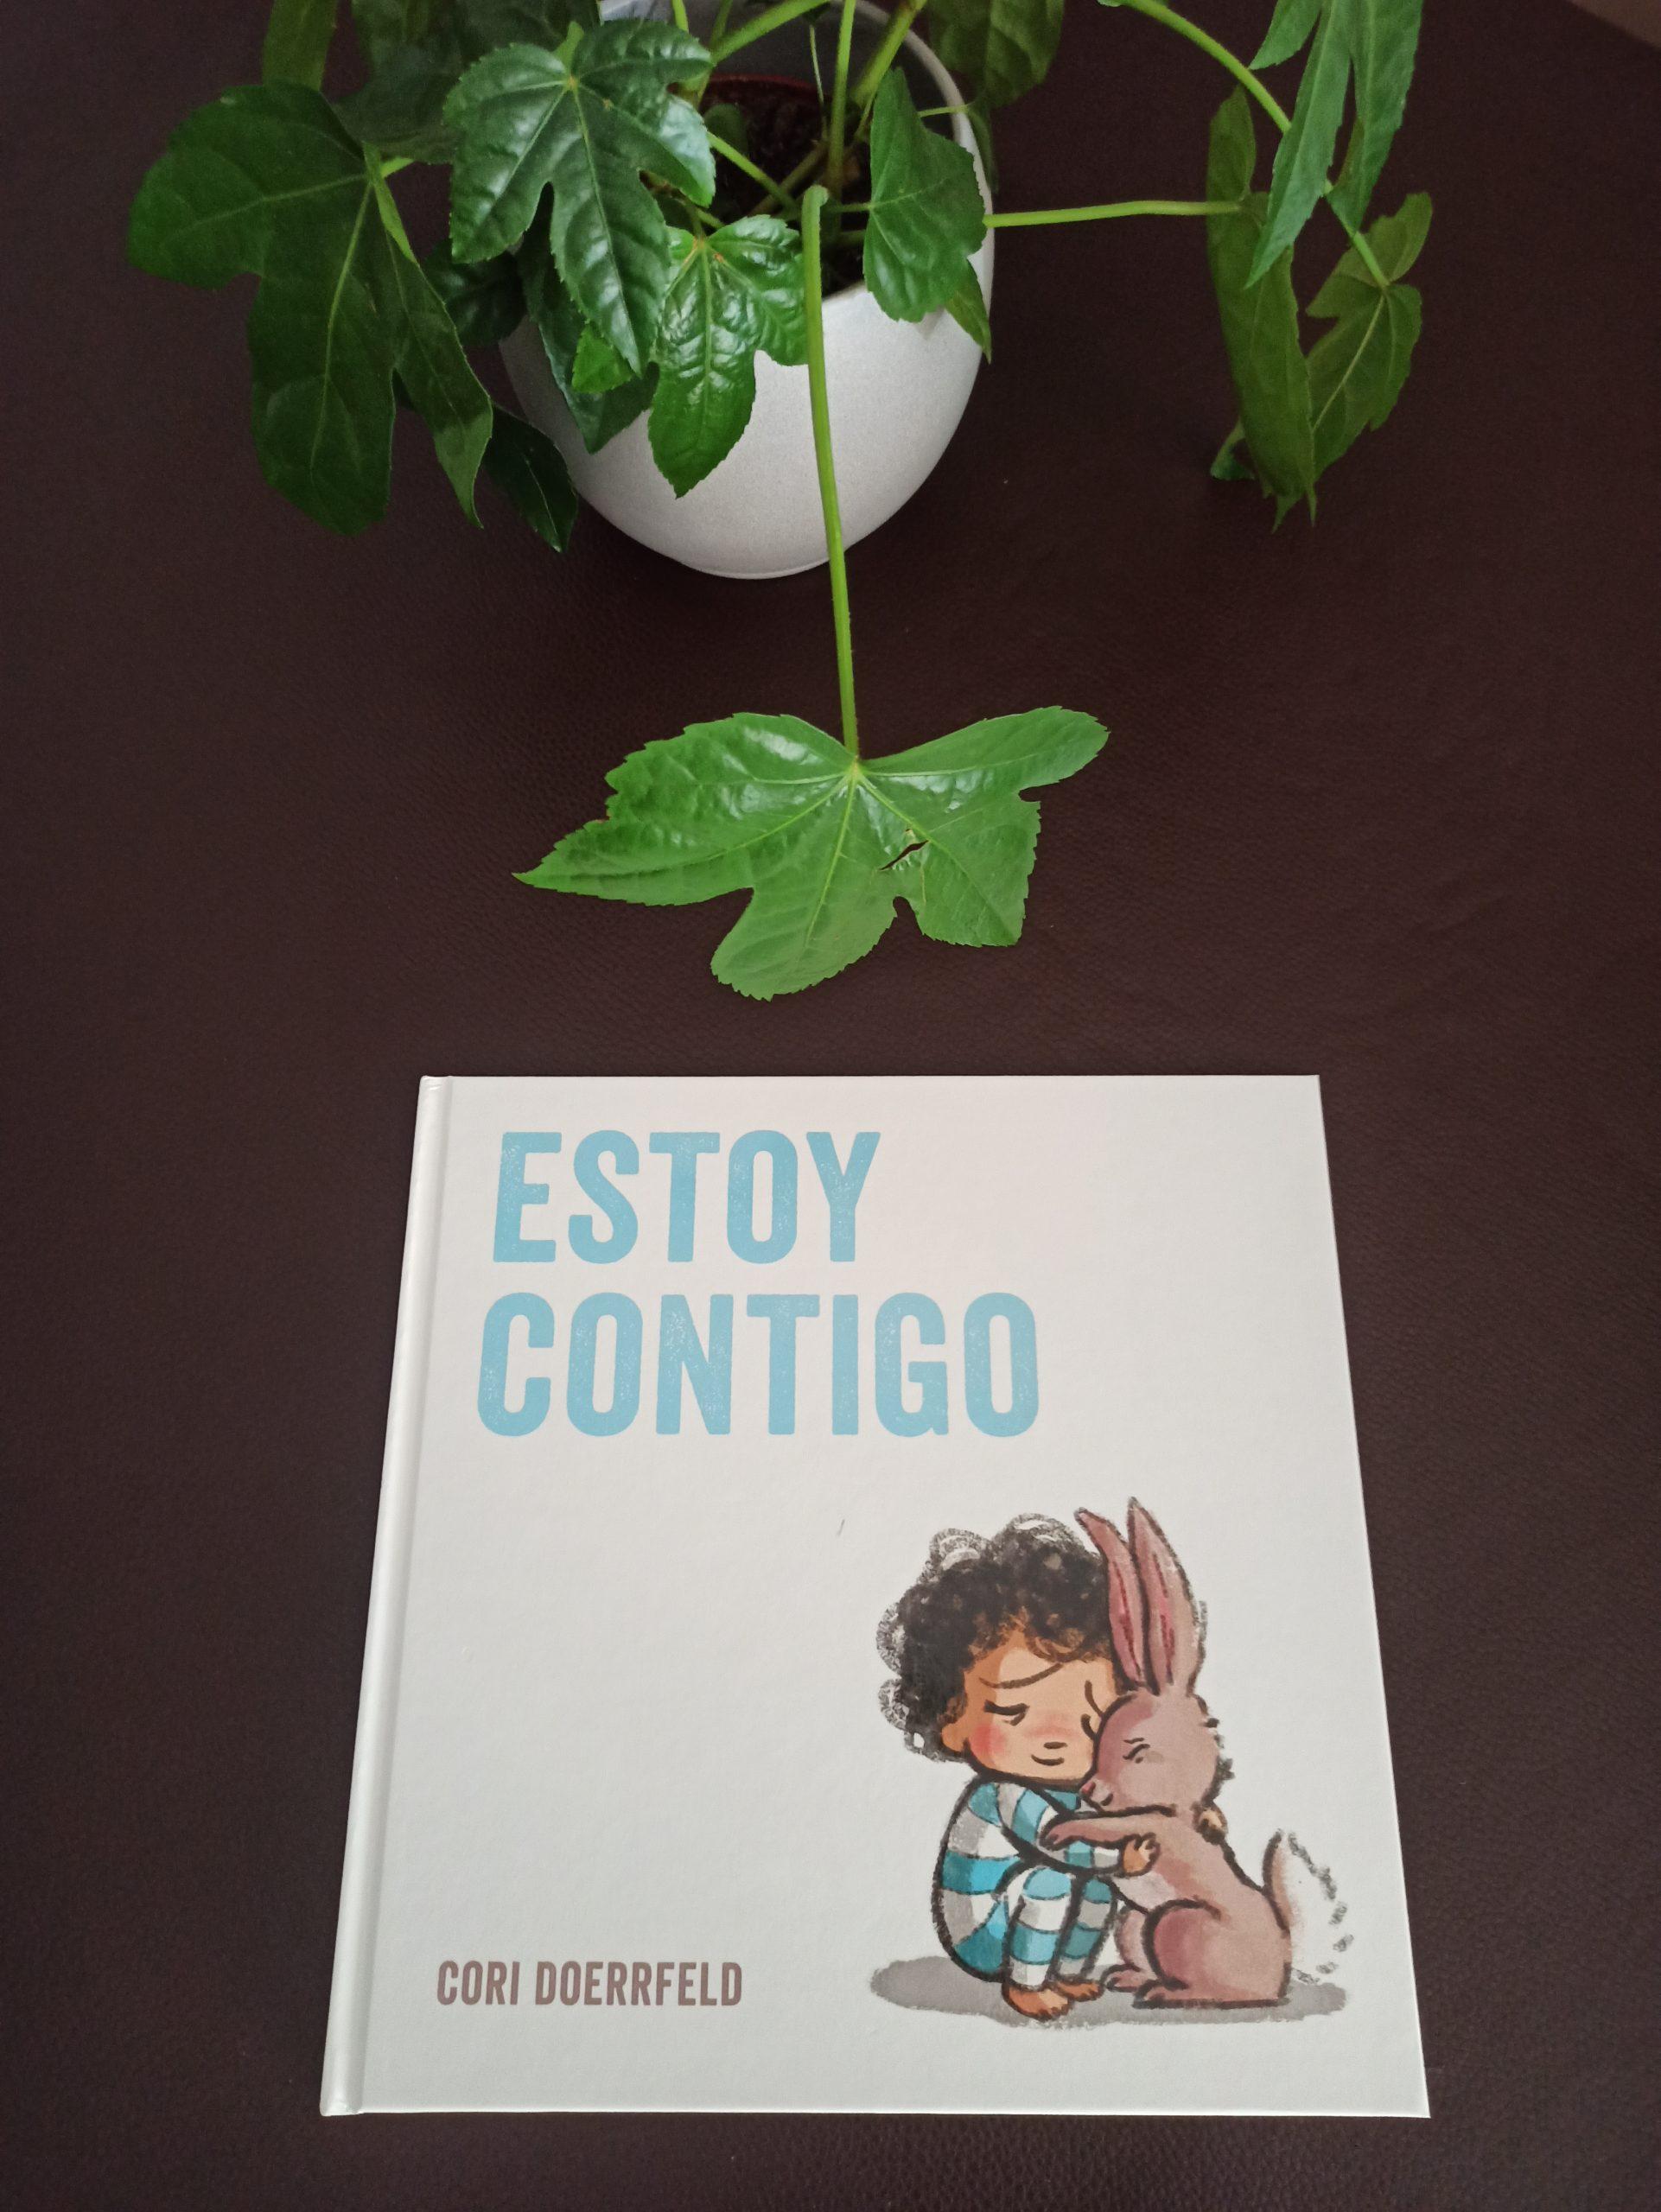 ESTOY CONTIGO